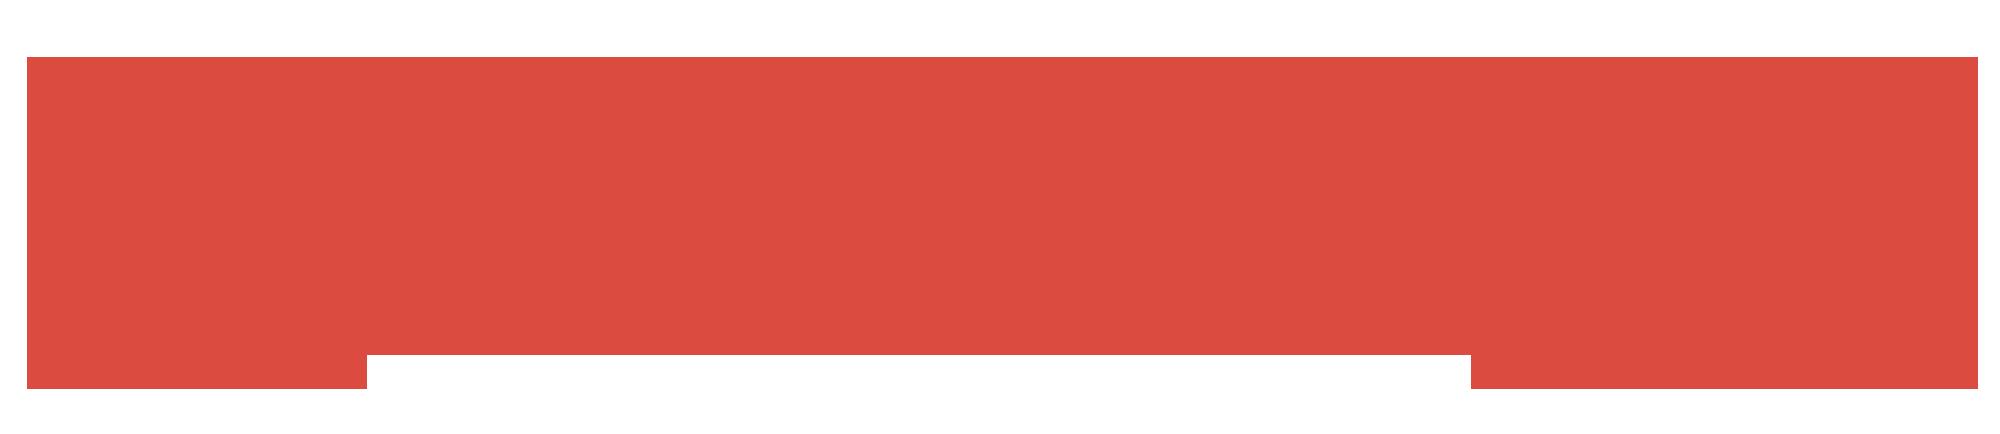 Smallstep logo